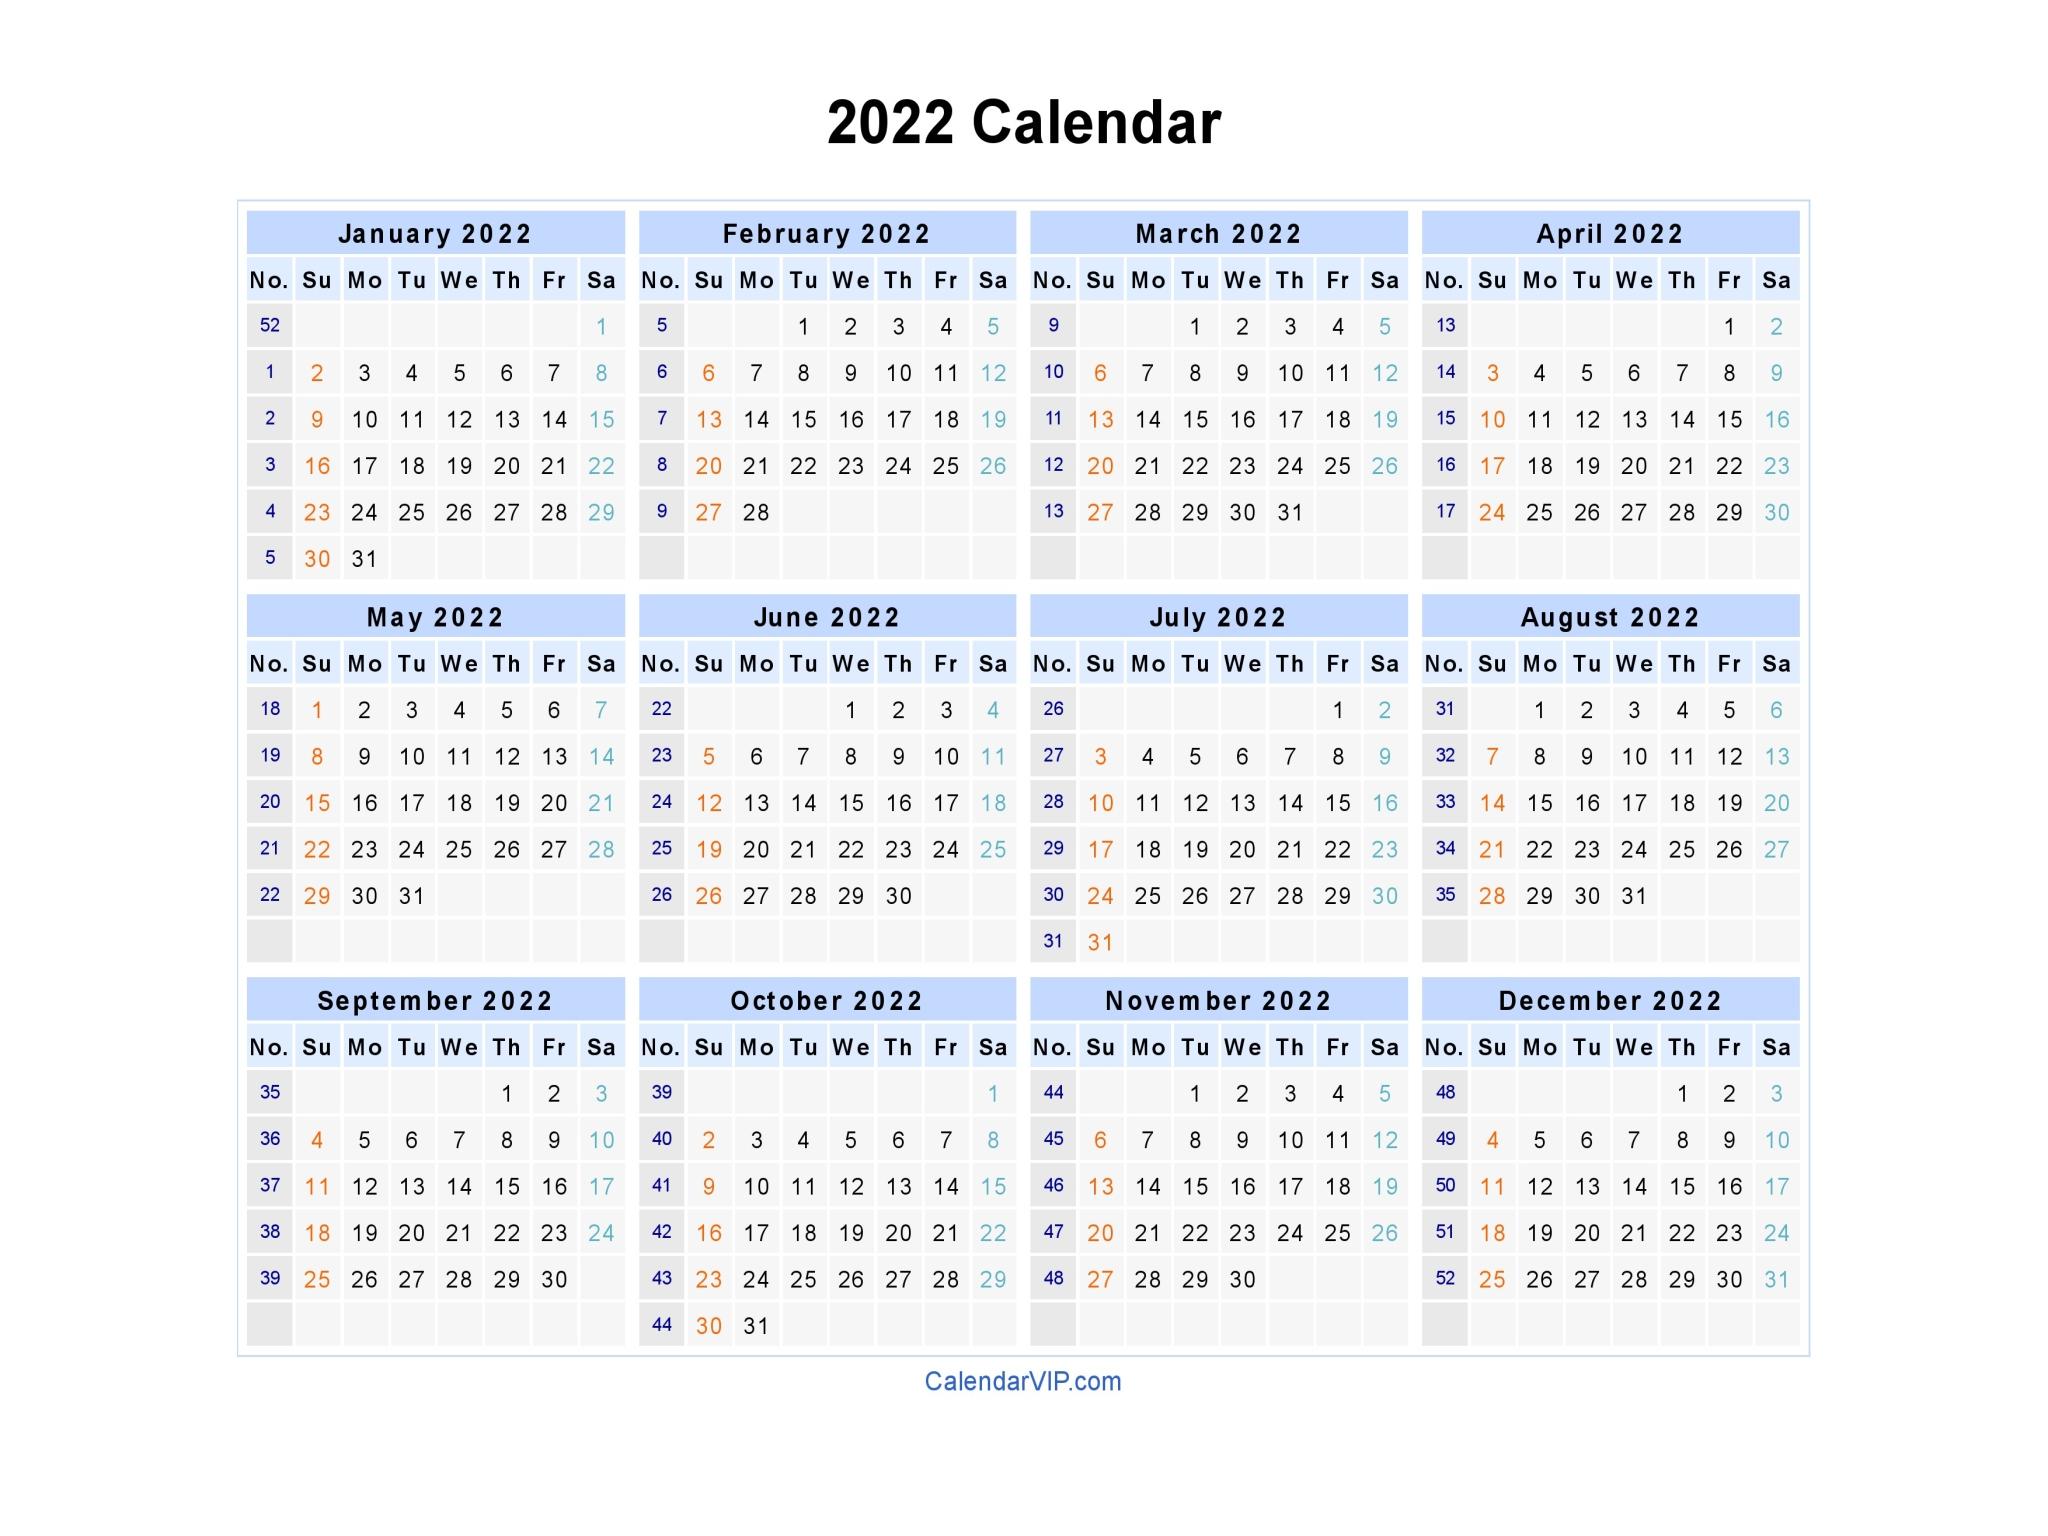 Blank printable calendar may 2022 pdf. 2022 Calendar - Blank Printable Calendar Template in PDF ...